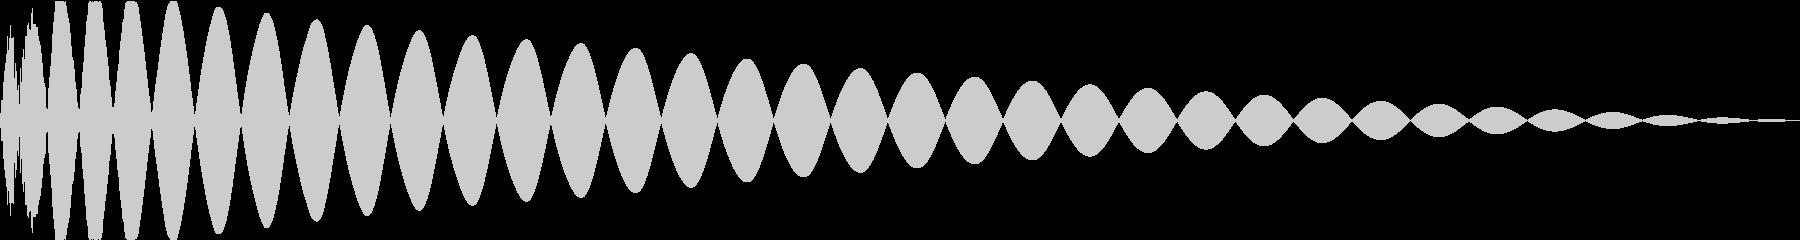 DTM Kick 96 オリジナル音源の未再生の波形